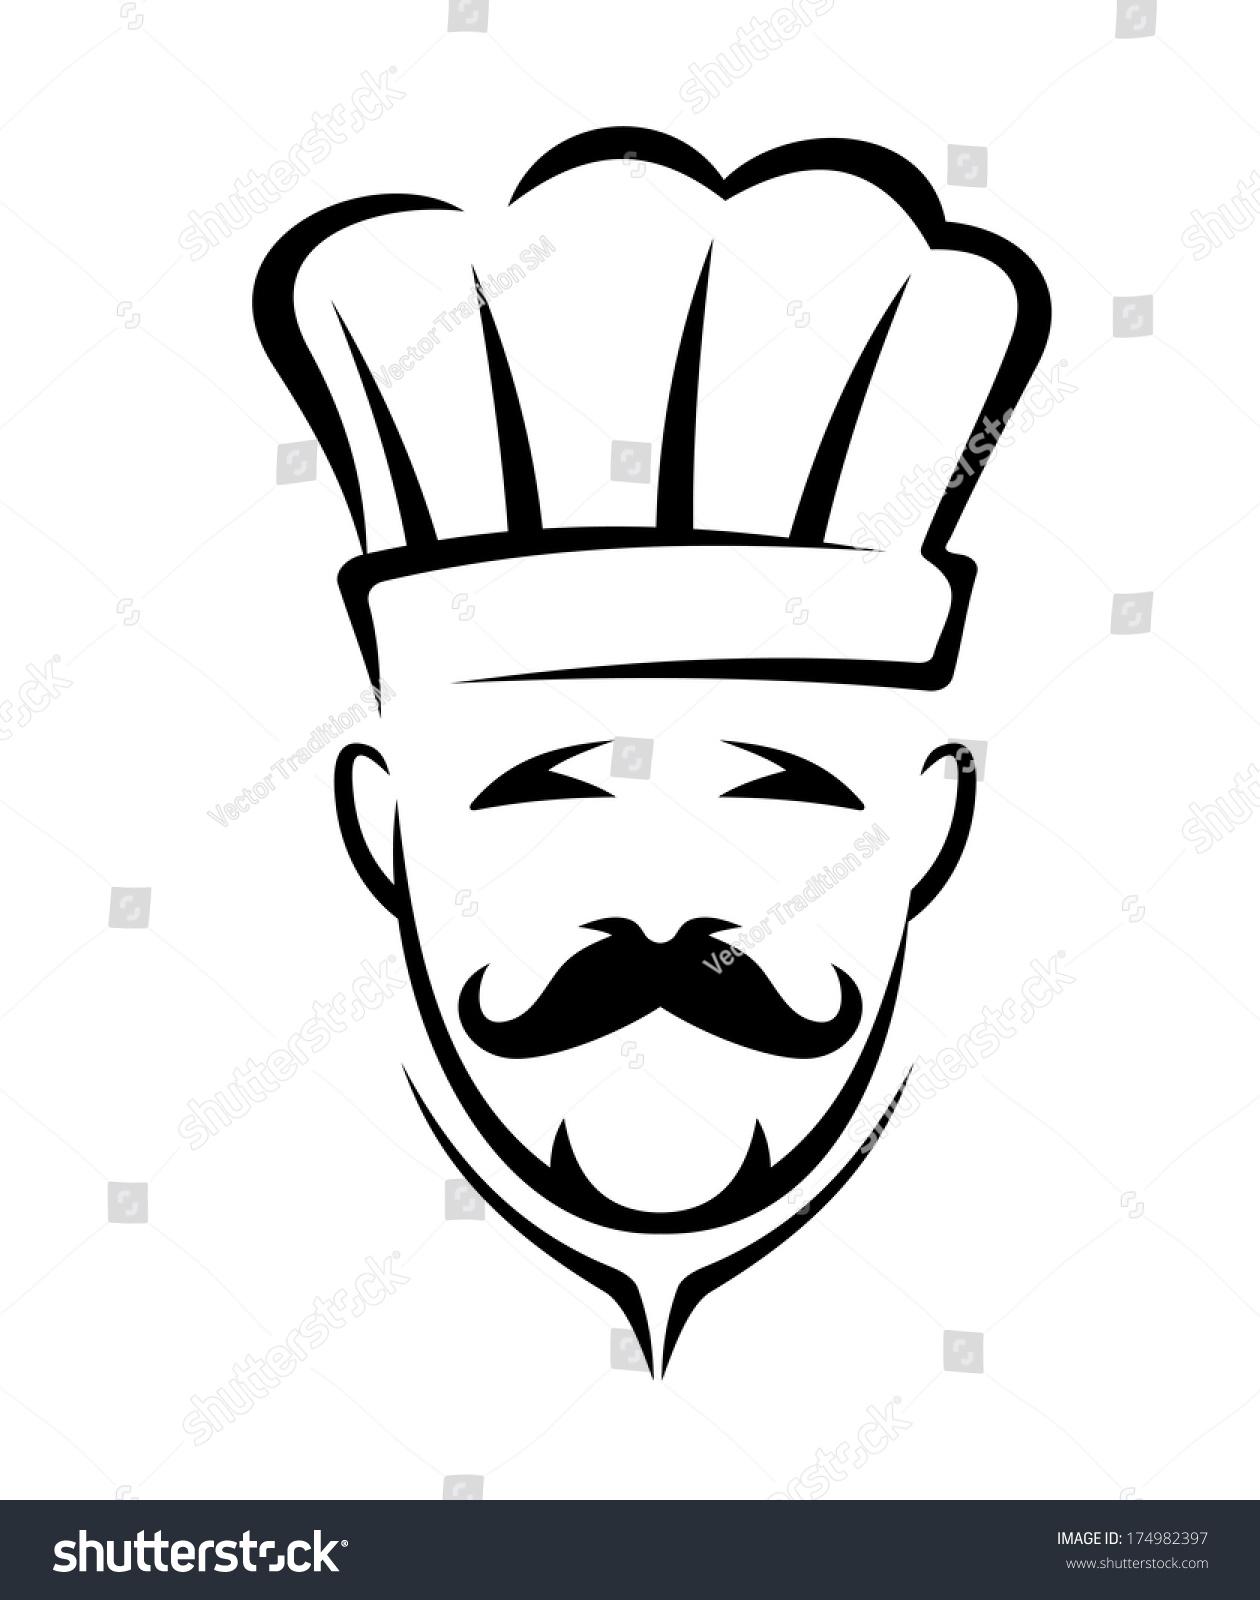 Stylized Black White Icon Chef Logo Stock Vector 174982397 ...